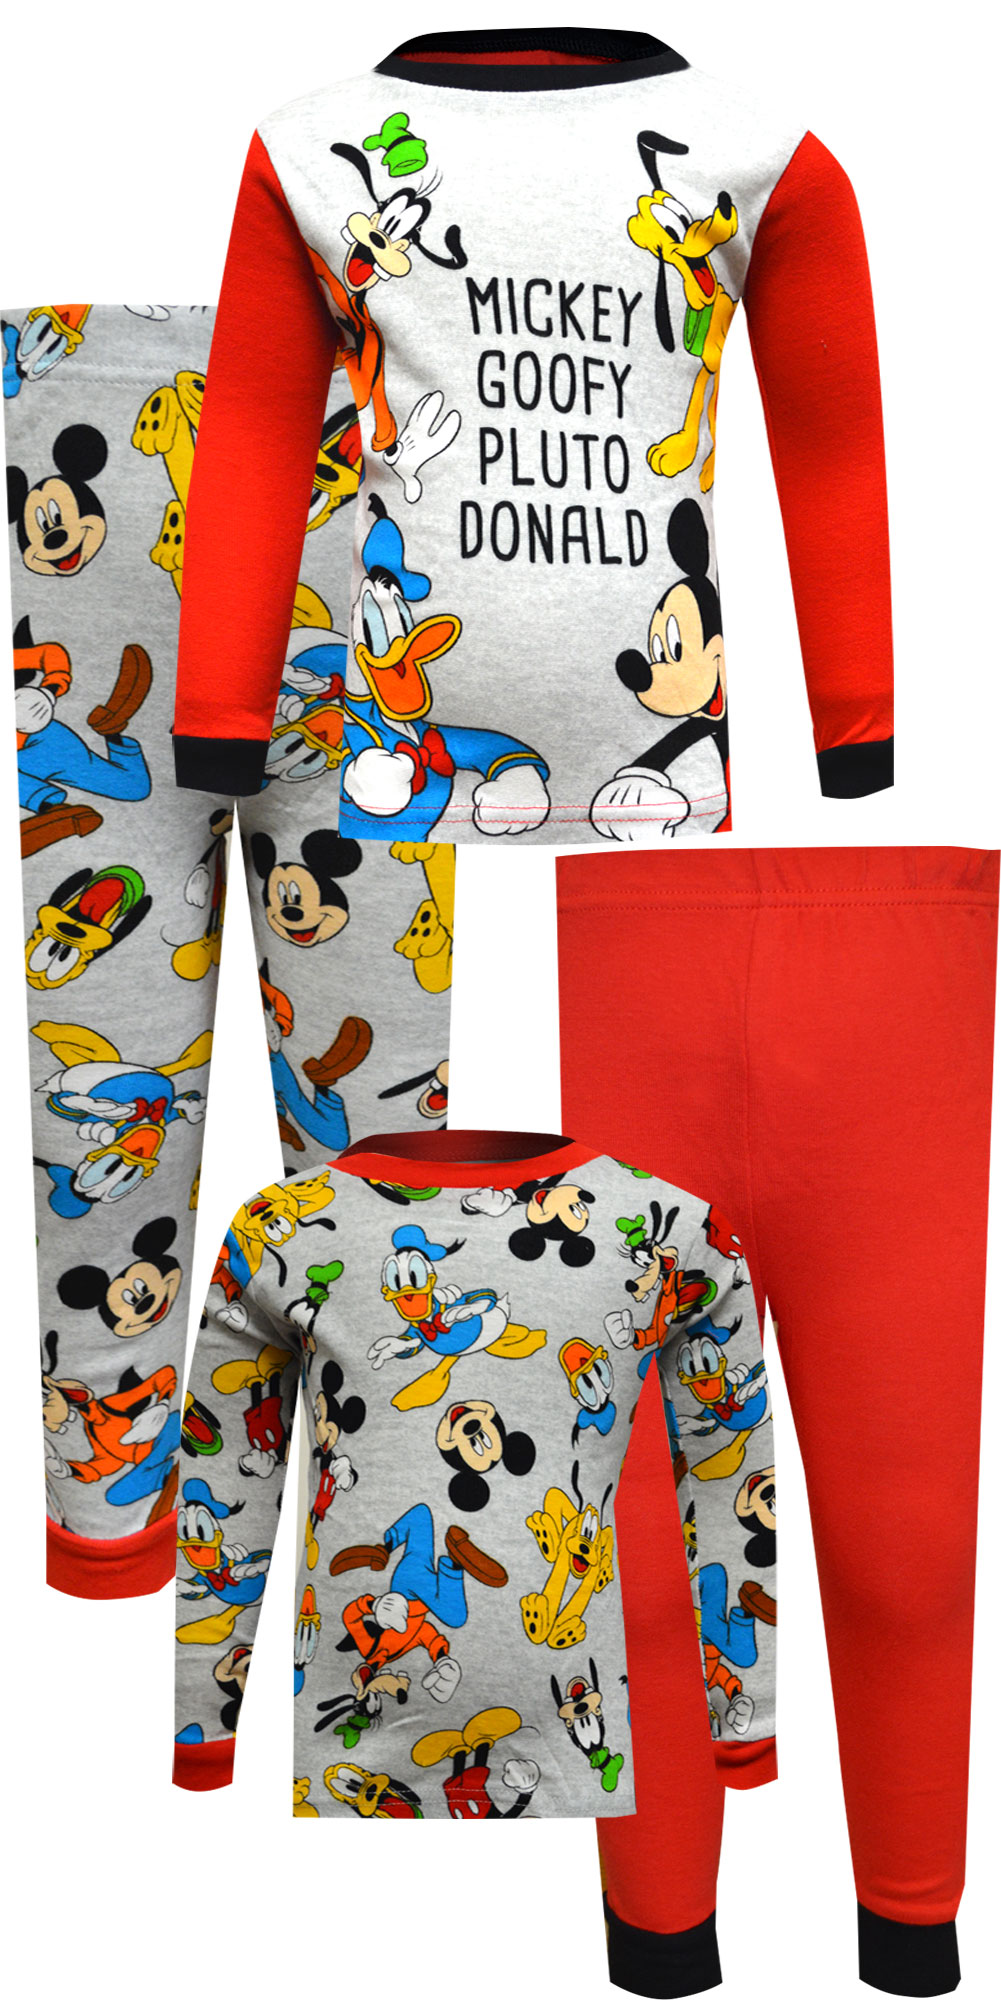 Image of Disney Jr Mickey Goofy Pluto Donald 4 Pc Cotton Toddler Pajamas for boys